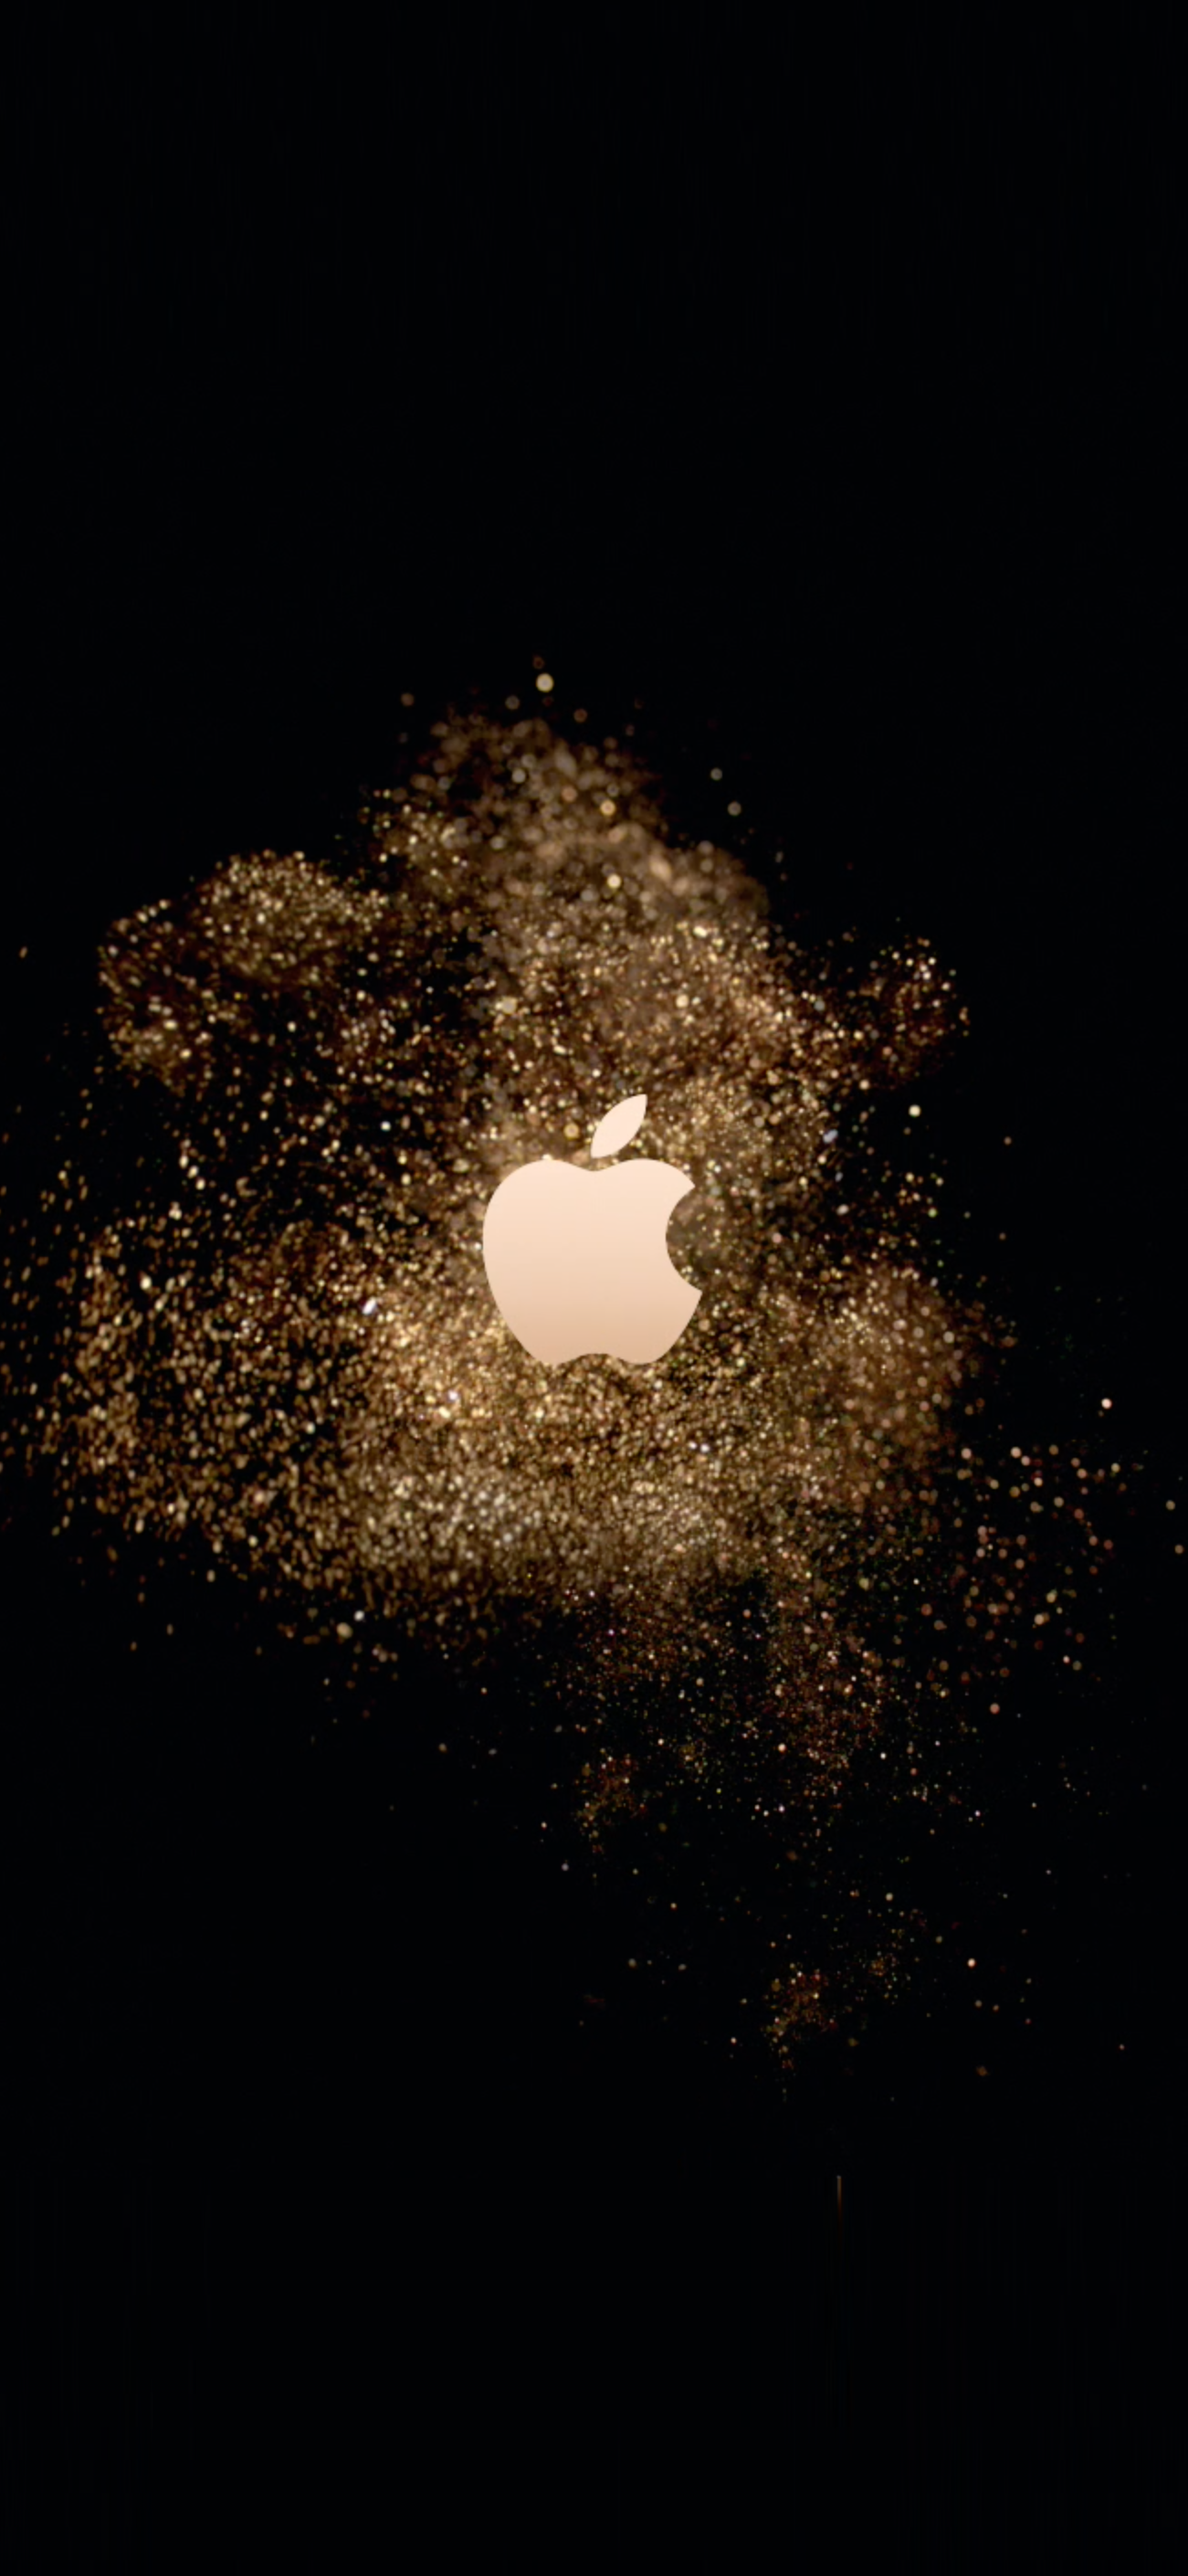 Apple Logo Stardust Live Wallpaper Wallpapers Central